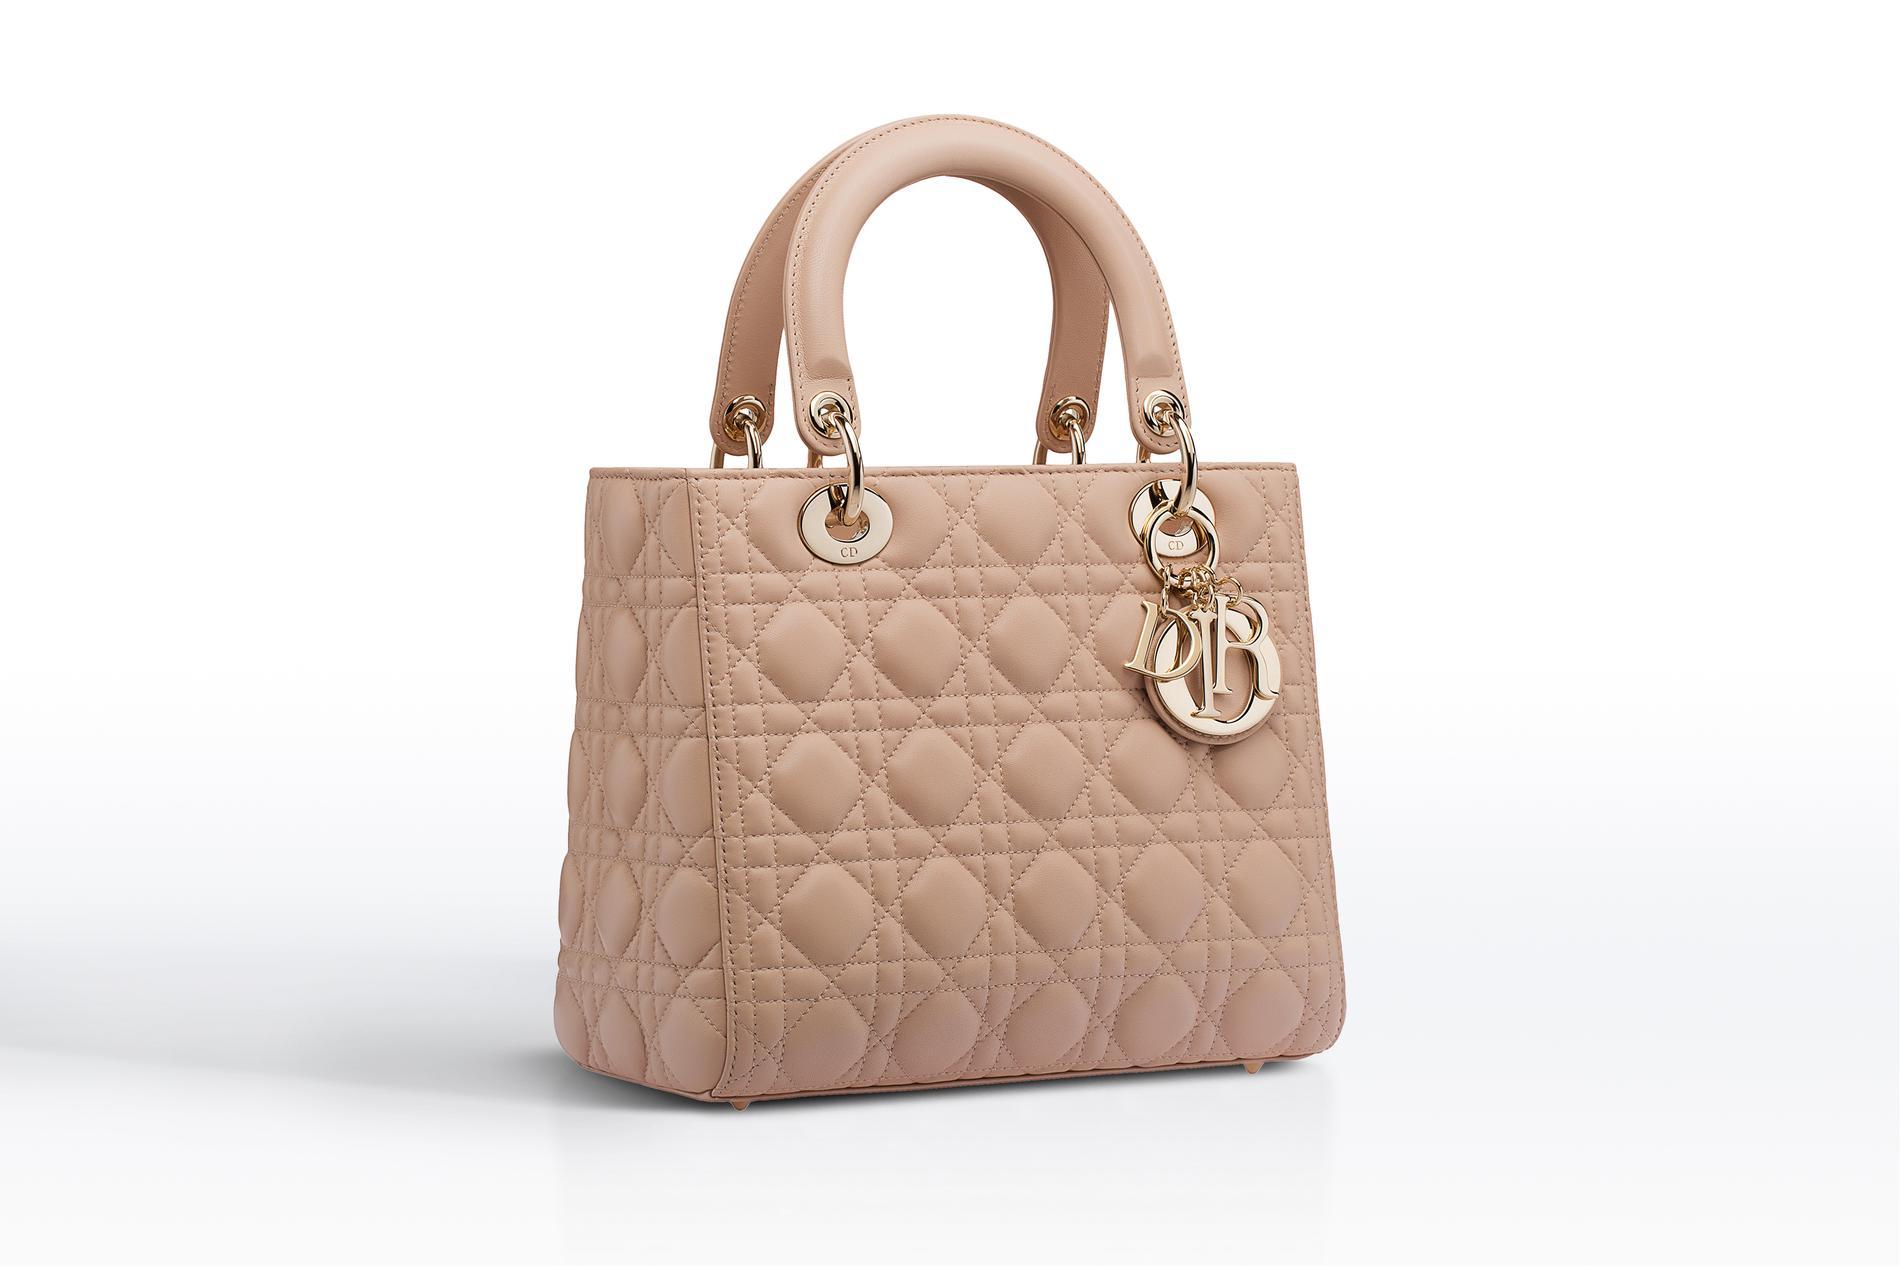 Ces stars qui ont un sac à leur nom - Madame Figaro 11234617169